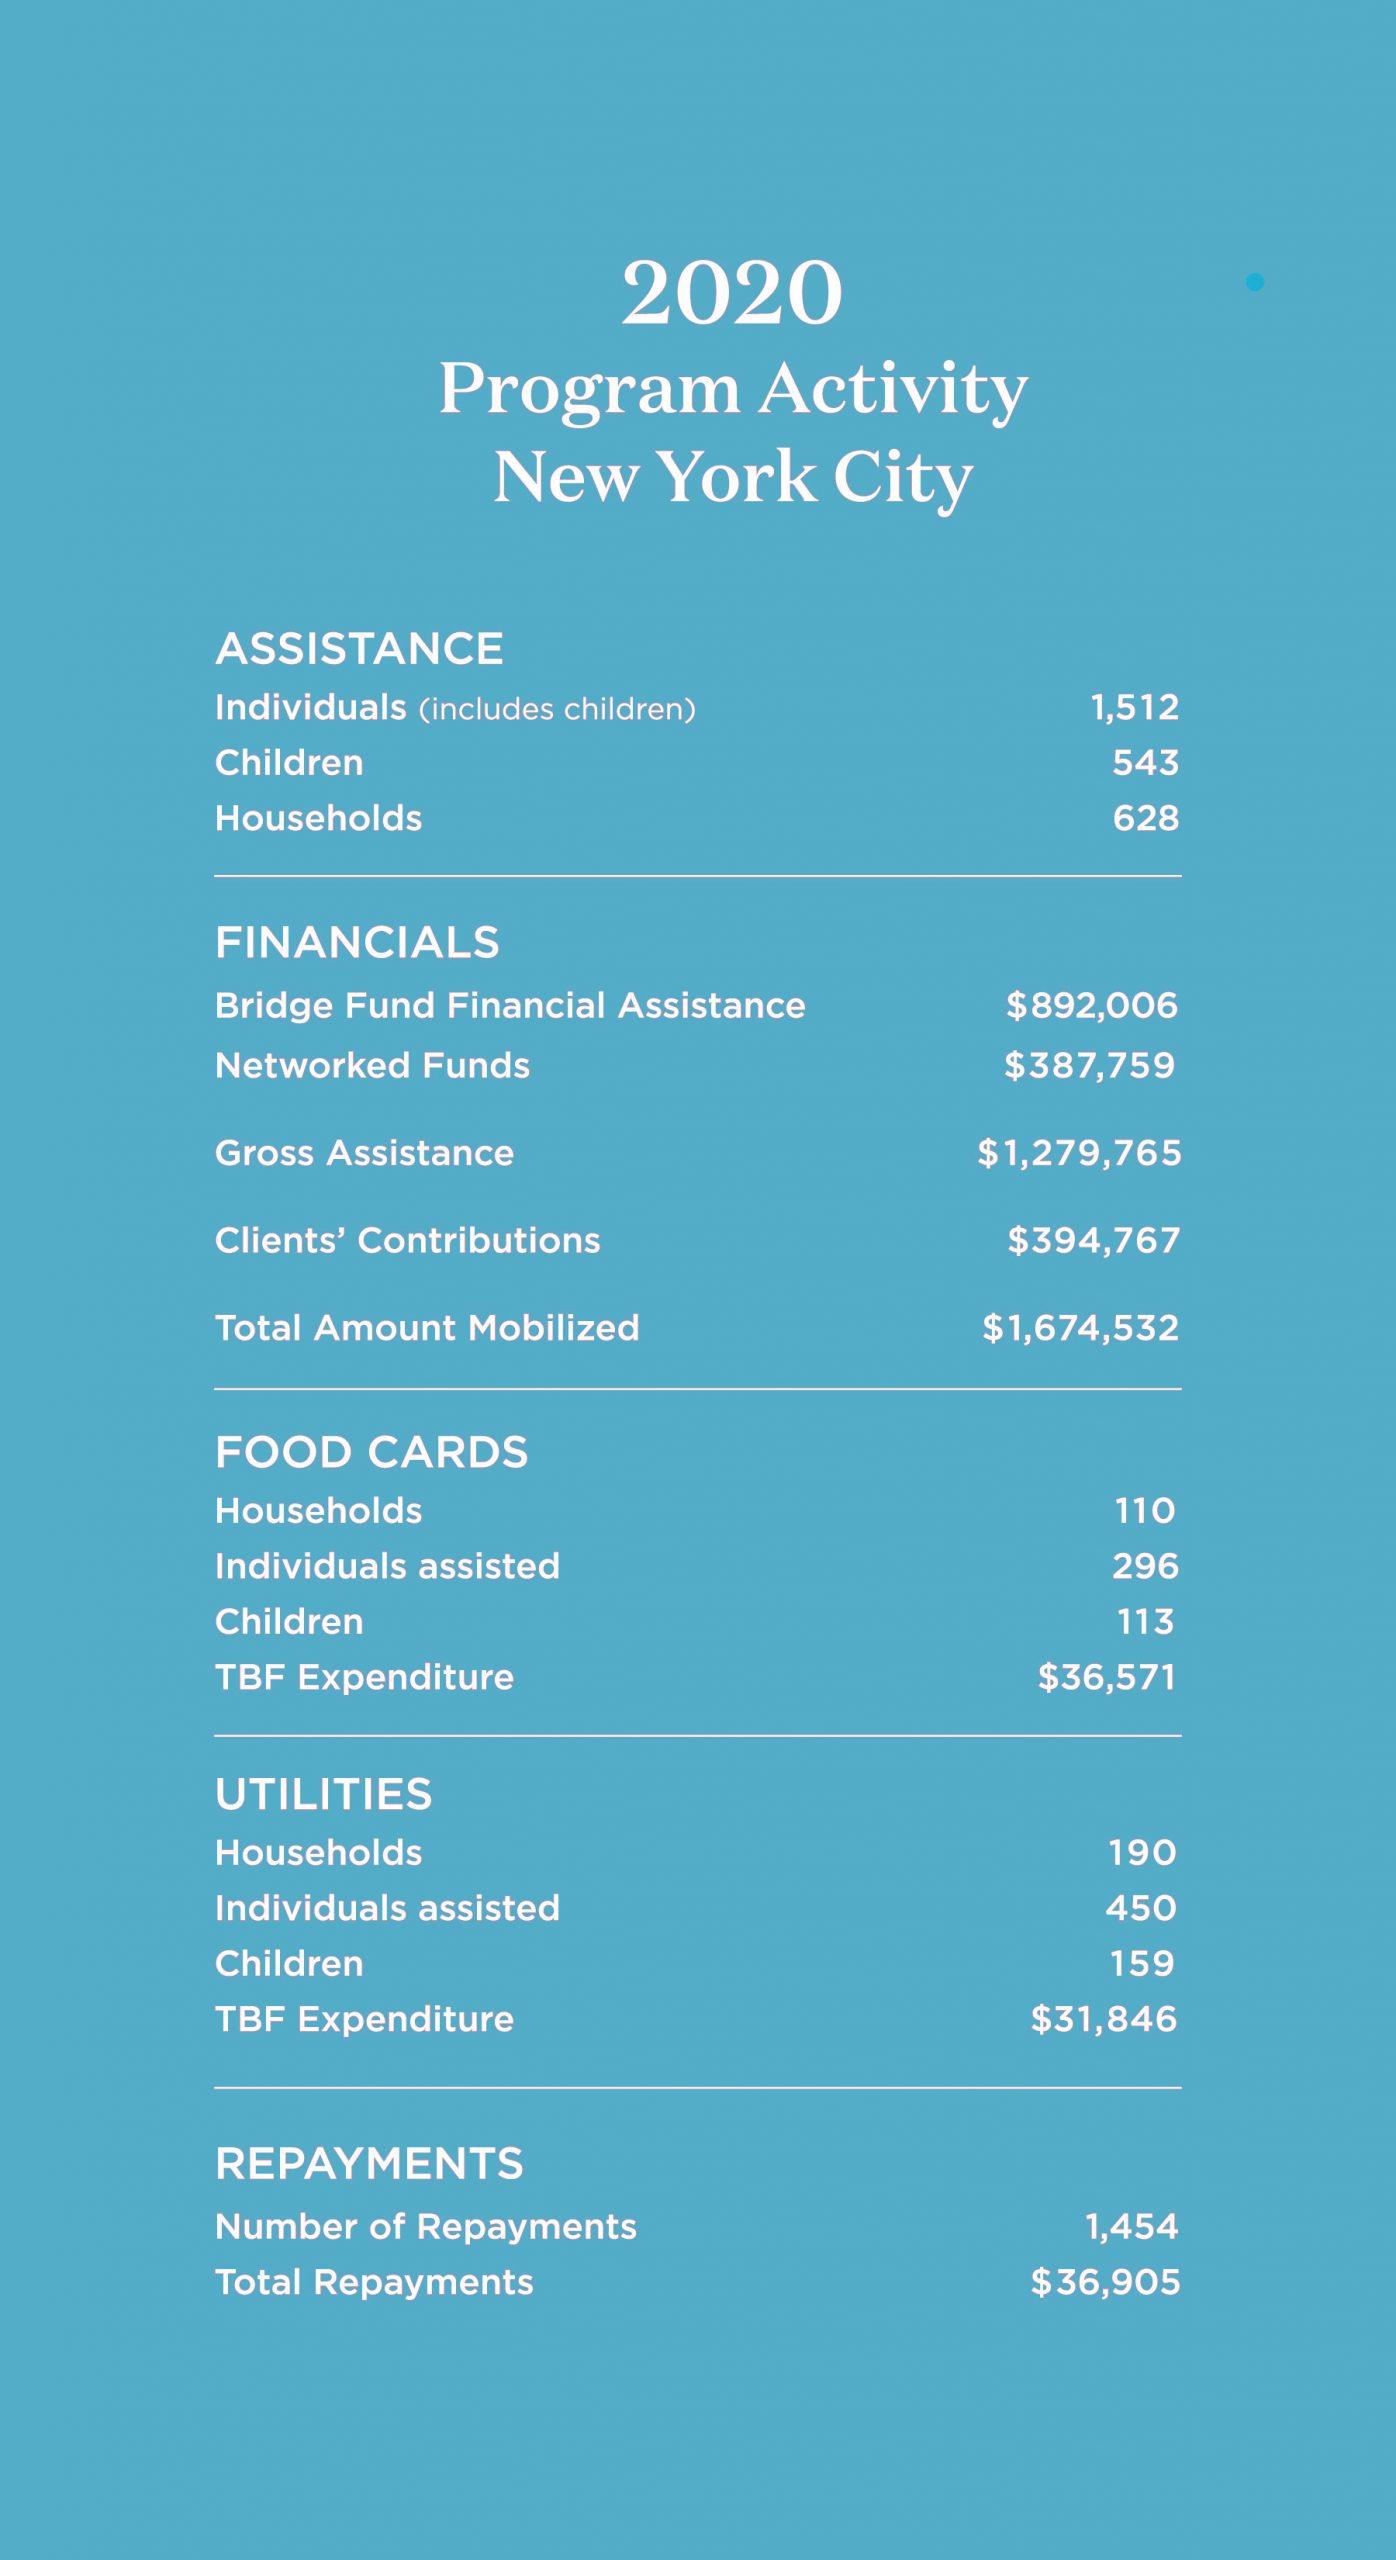 2020 New York City Program Activity Chart